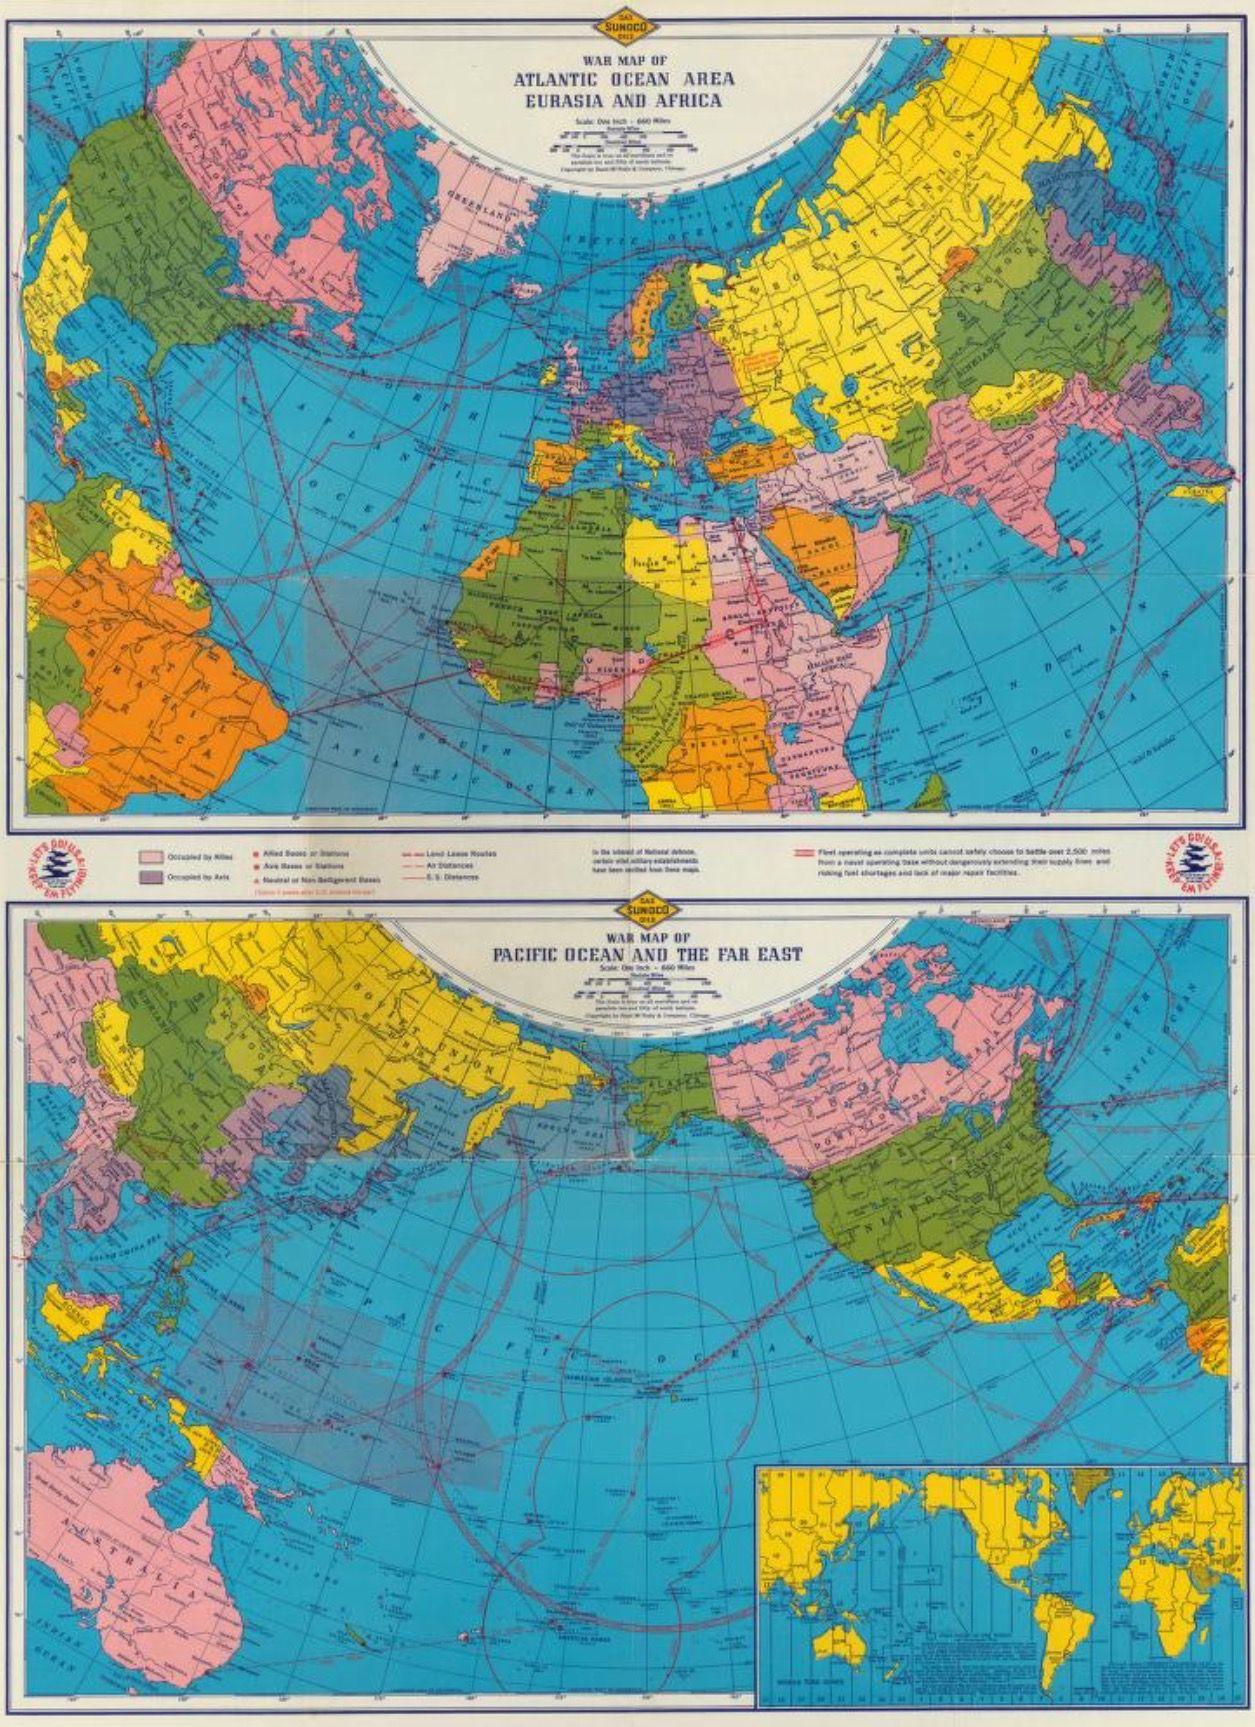 Rand McNally and Sun Oil Company. 1942 War map of Atlantic Ocean ...